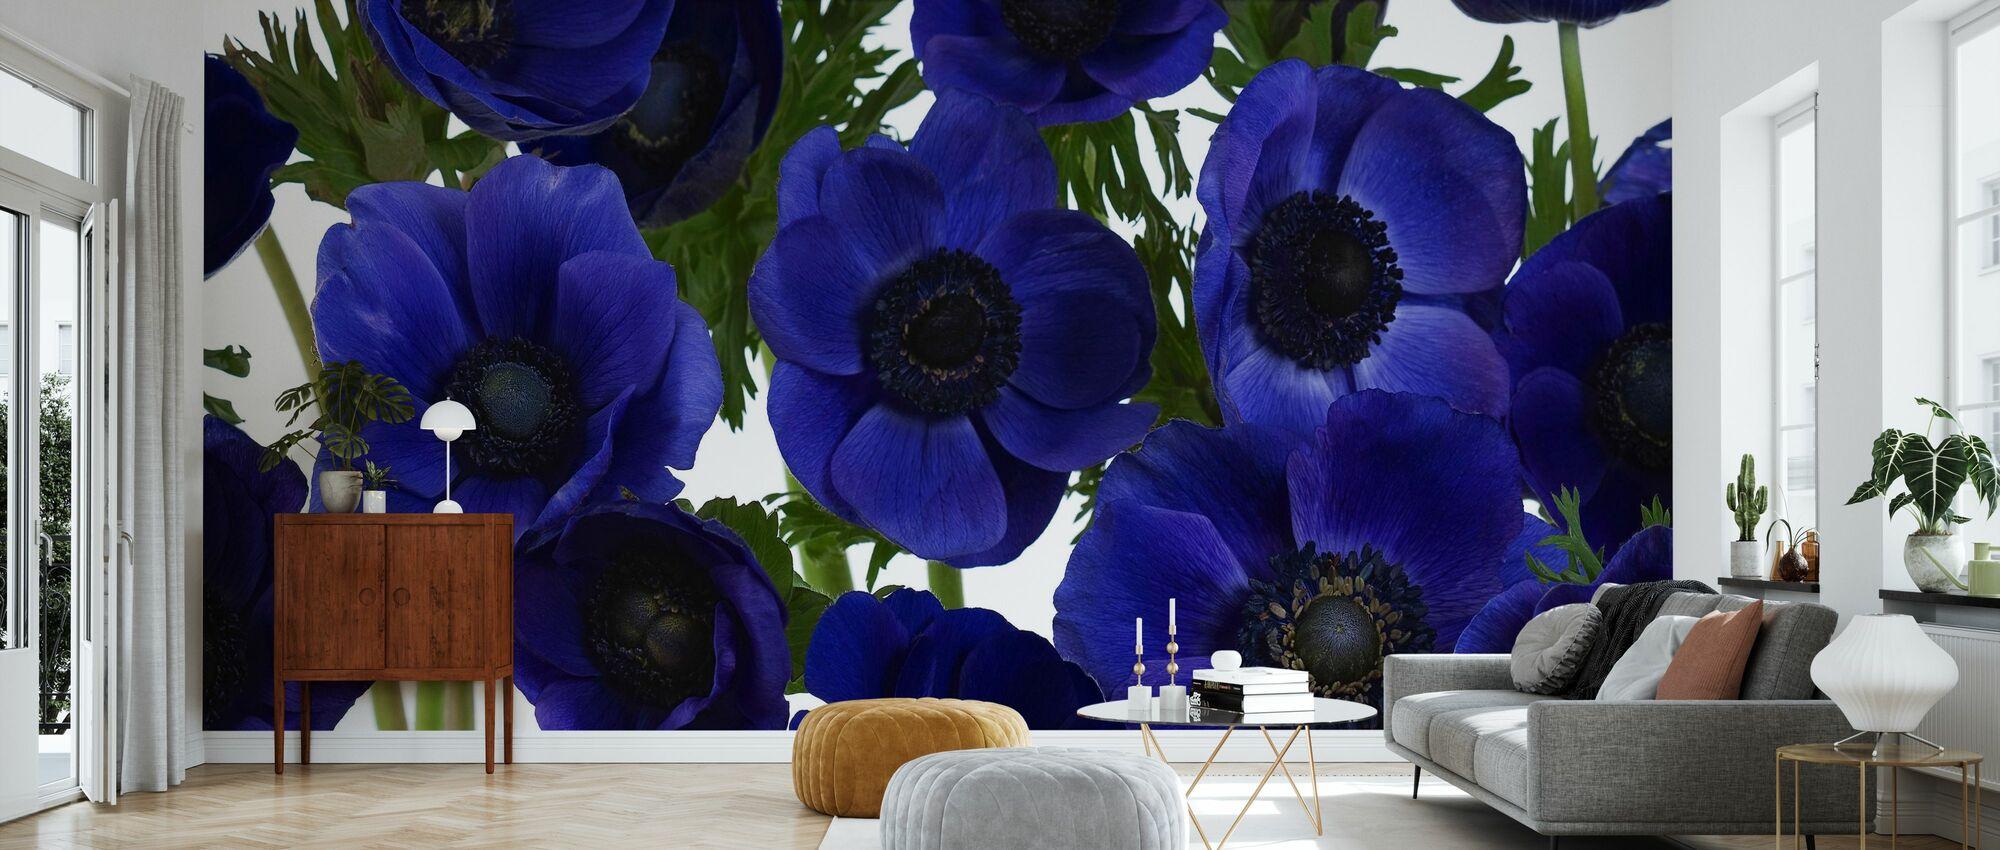 Panoramic Flowers - Blue - Wallpaper - Living Room